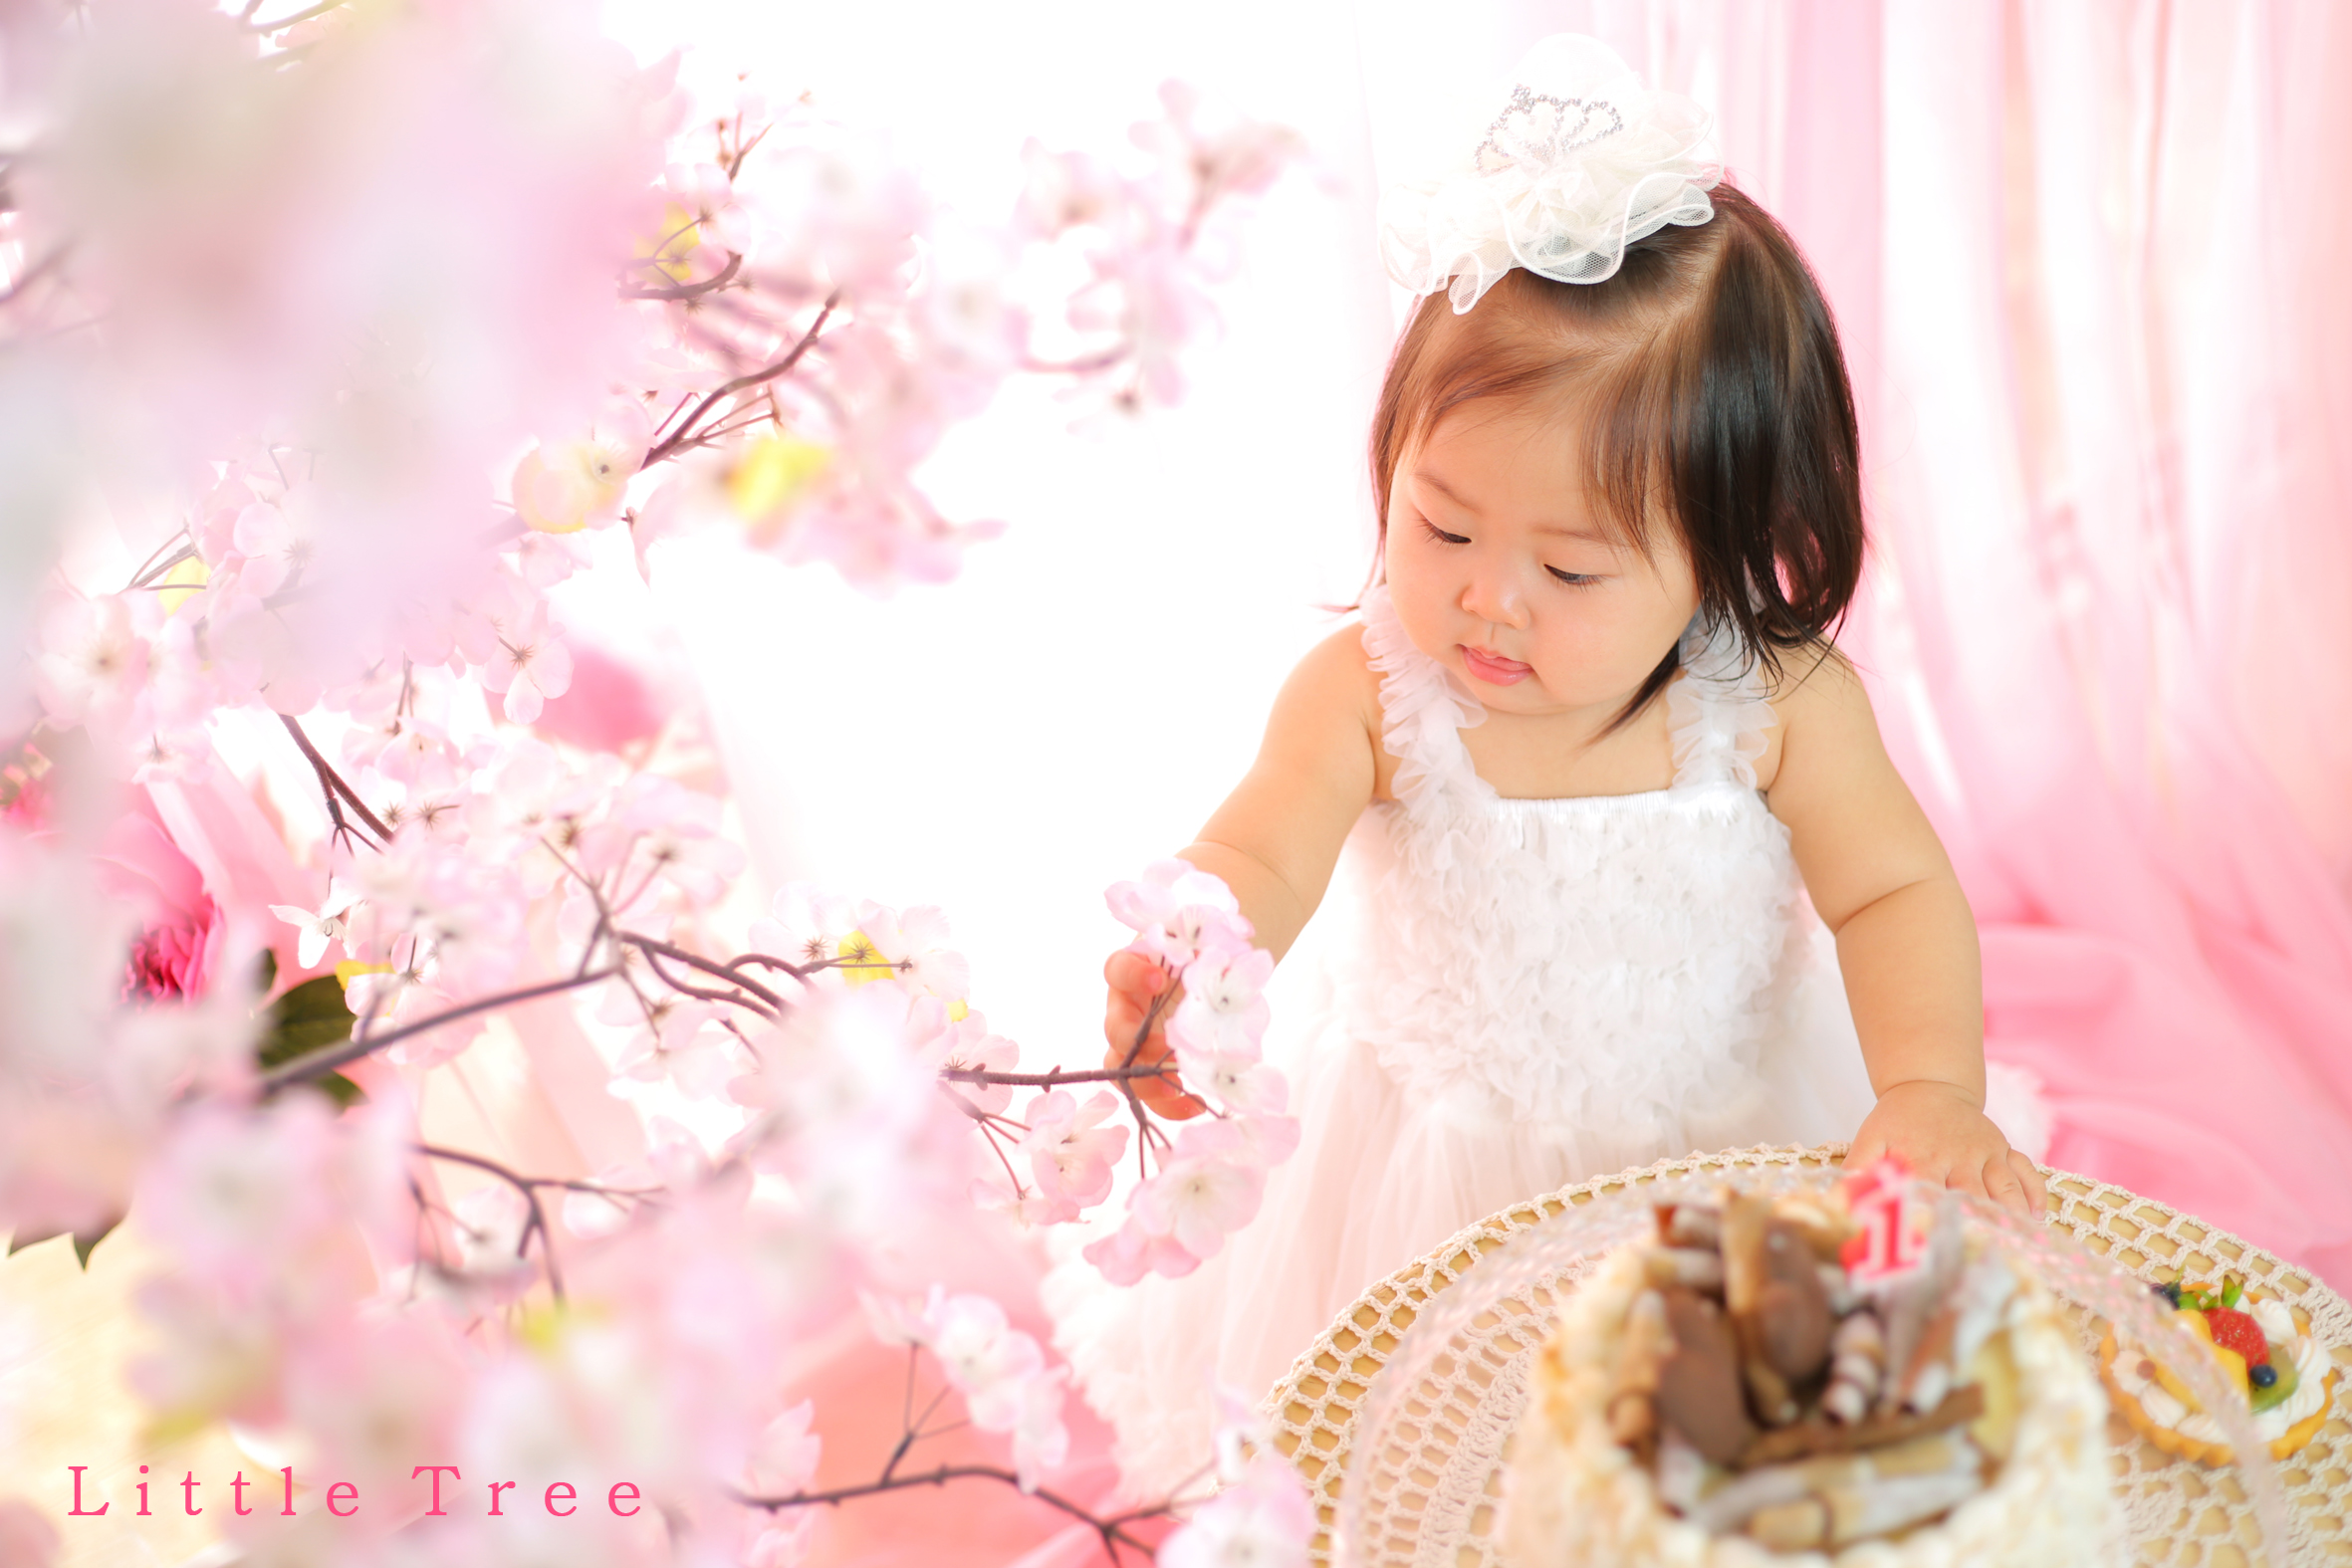 littletree baby181